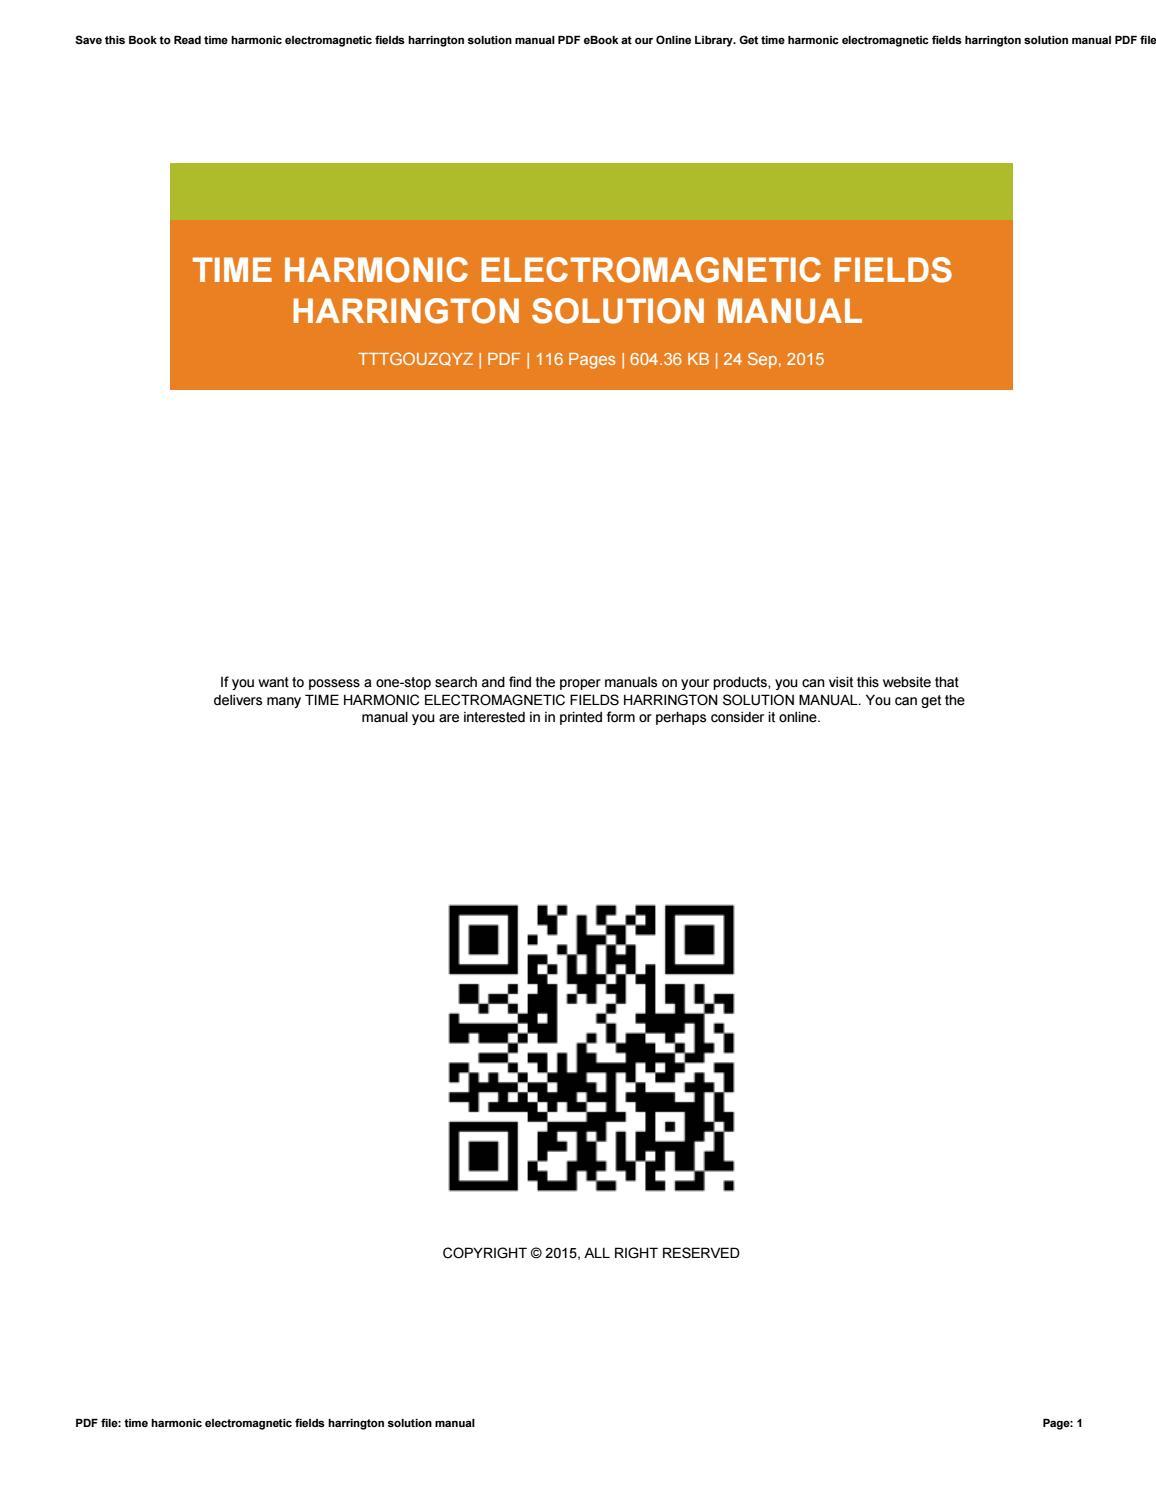 Time harmonic electromagnetic fields harrington solution